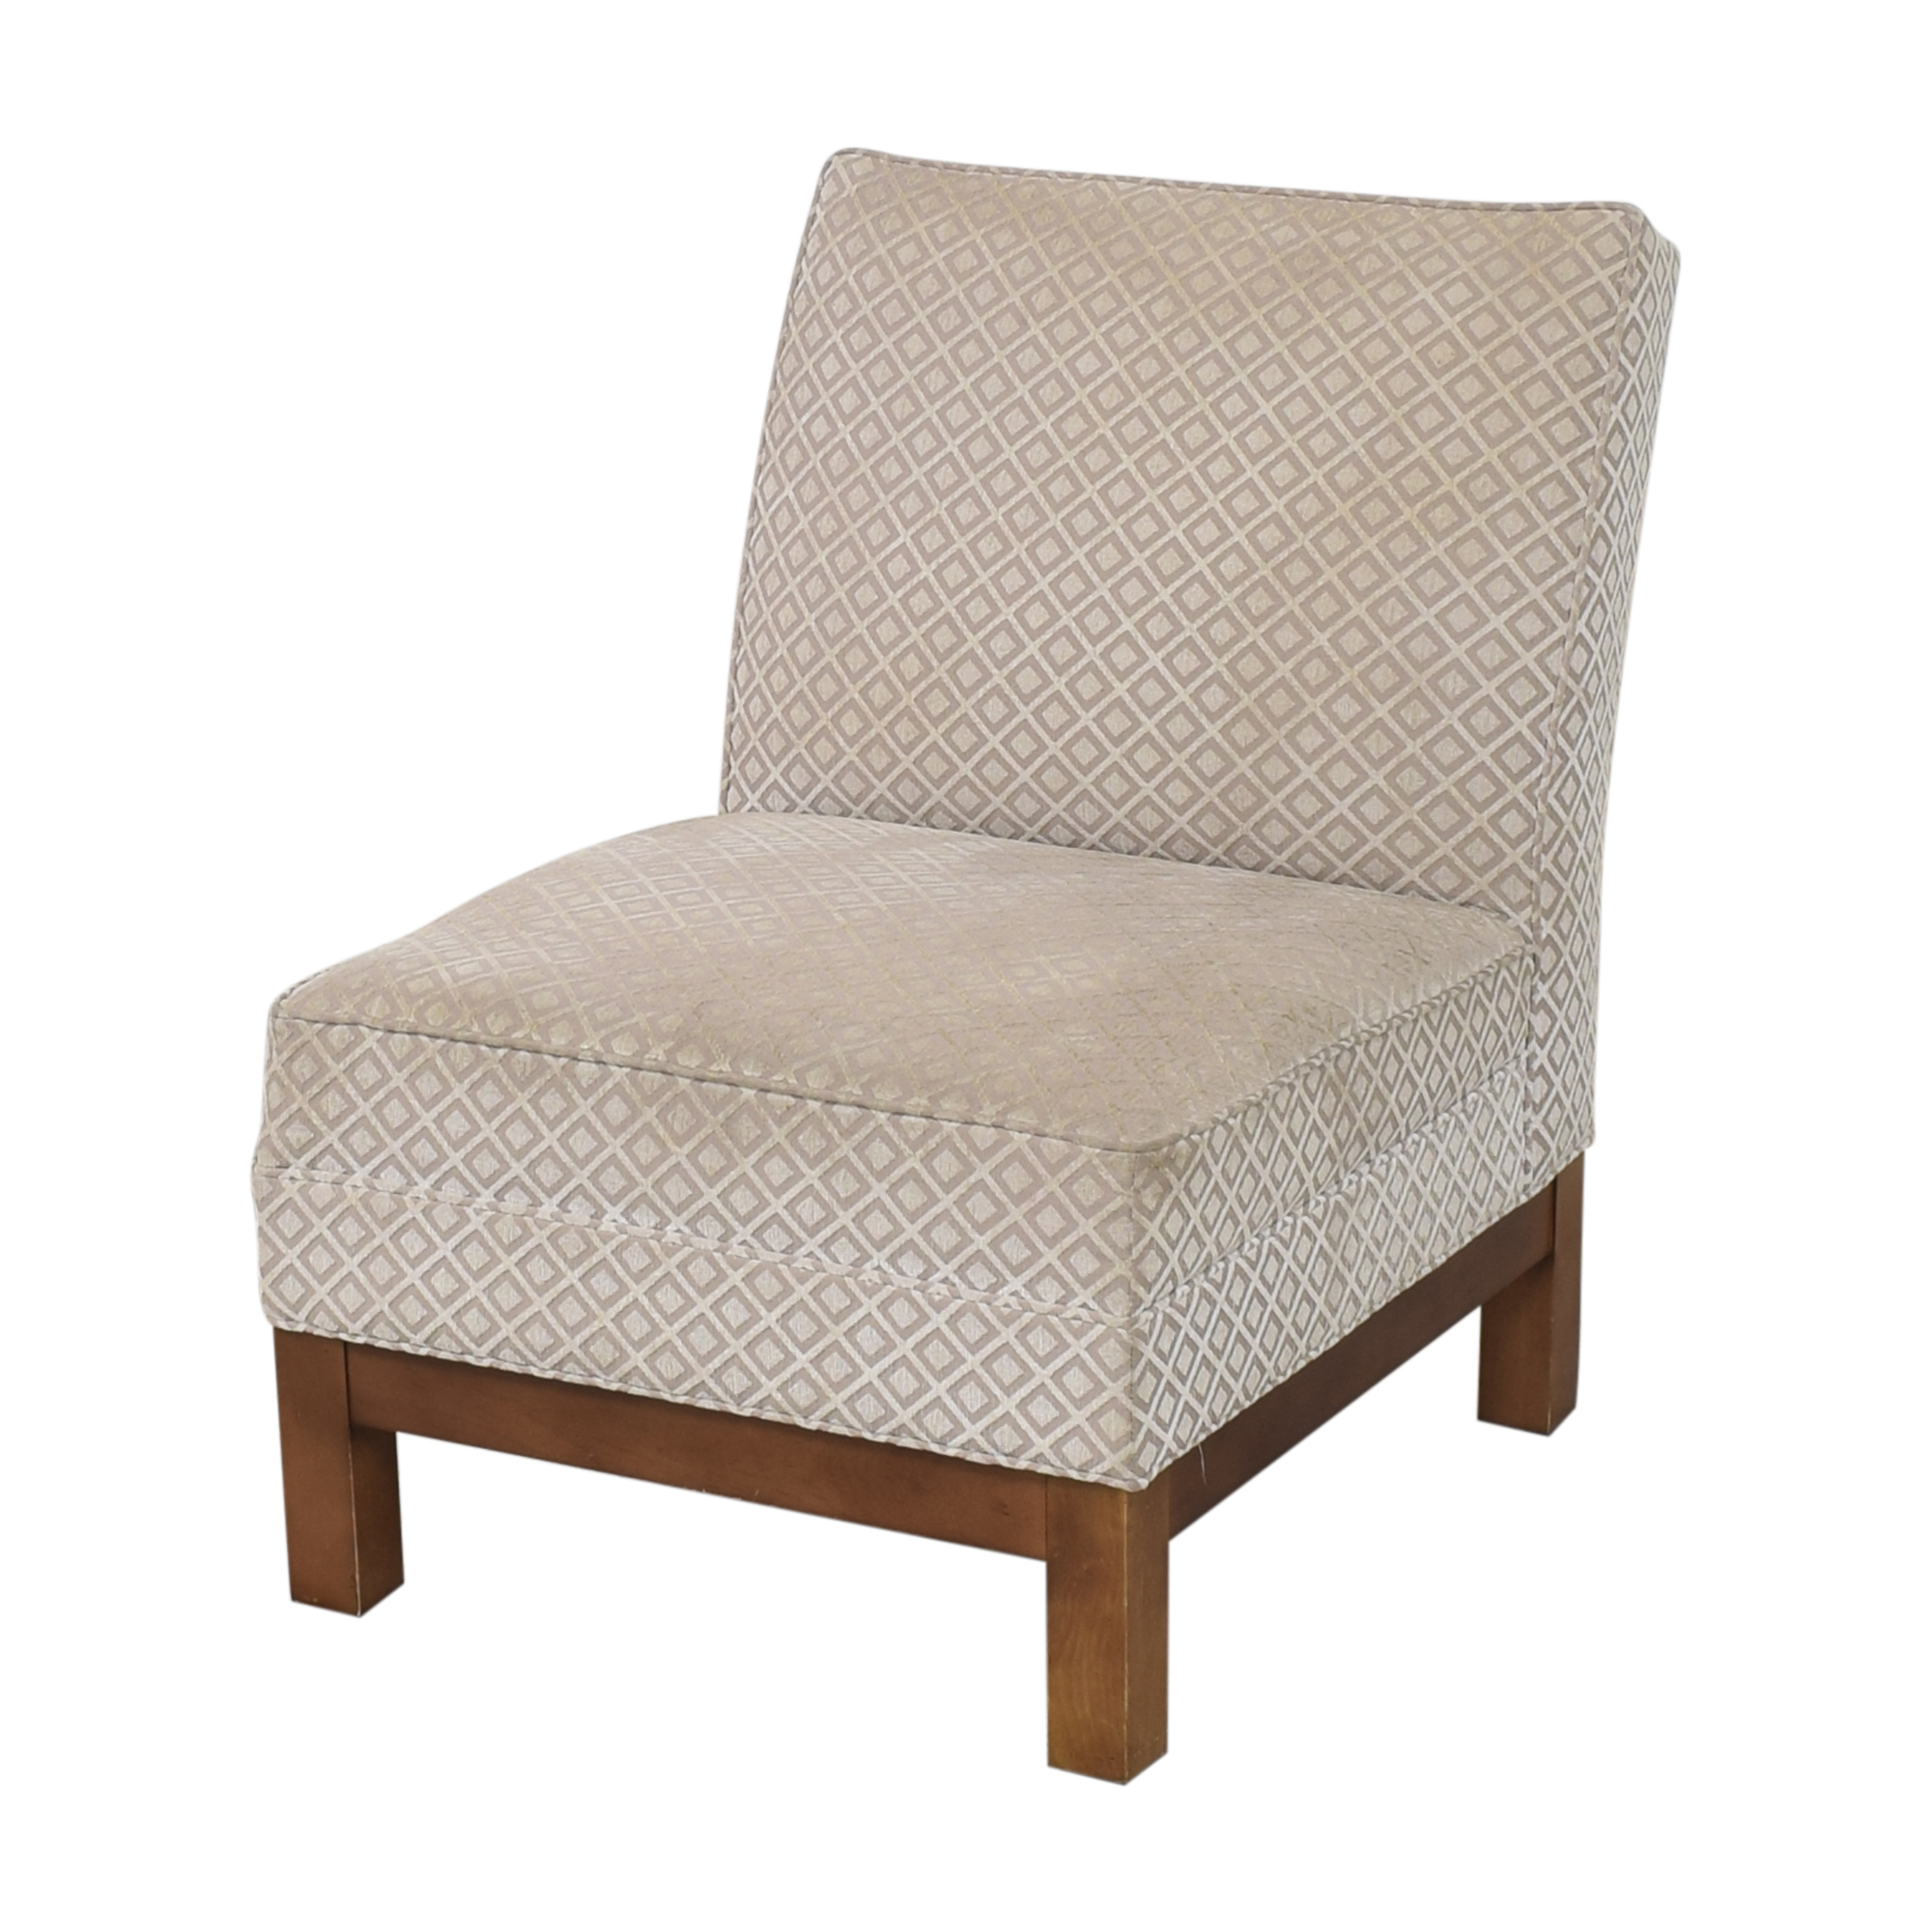 Mitchell Gold + Bob Williams Mitchell Gold + Bob Williams Slipper Chair Accent Chairs